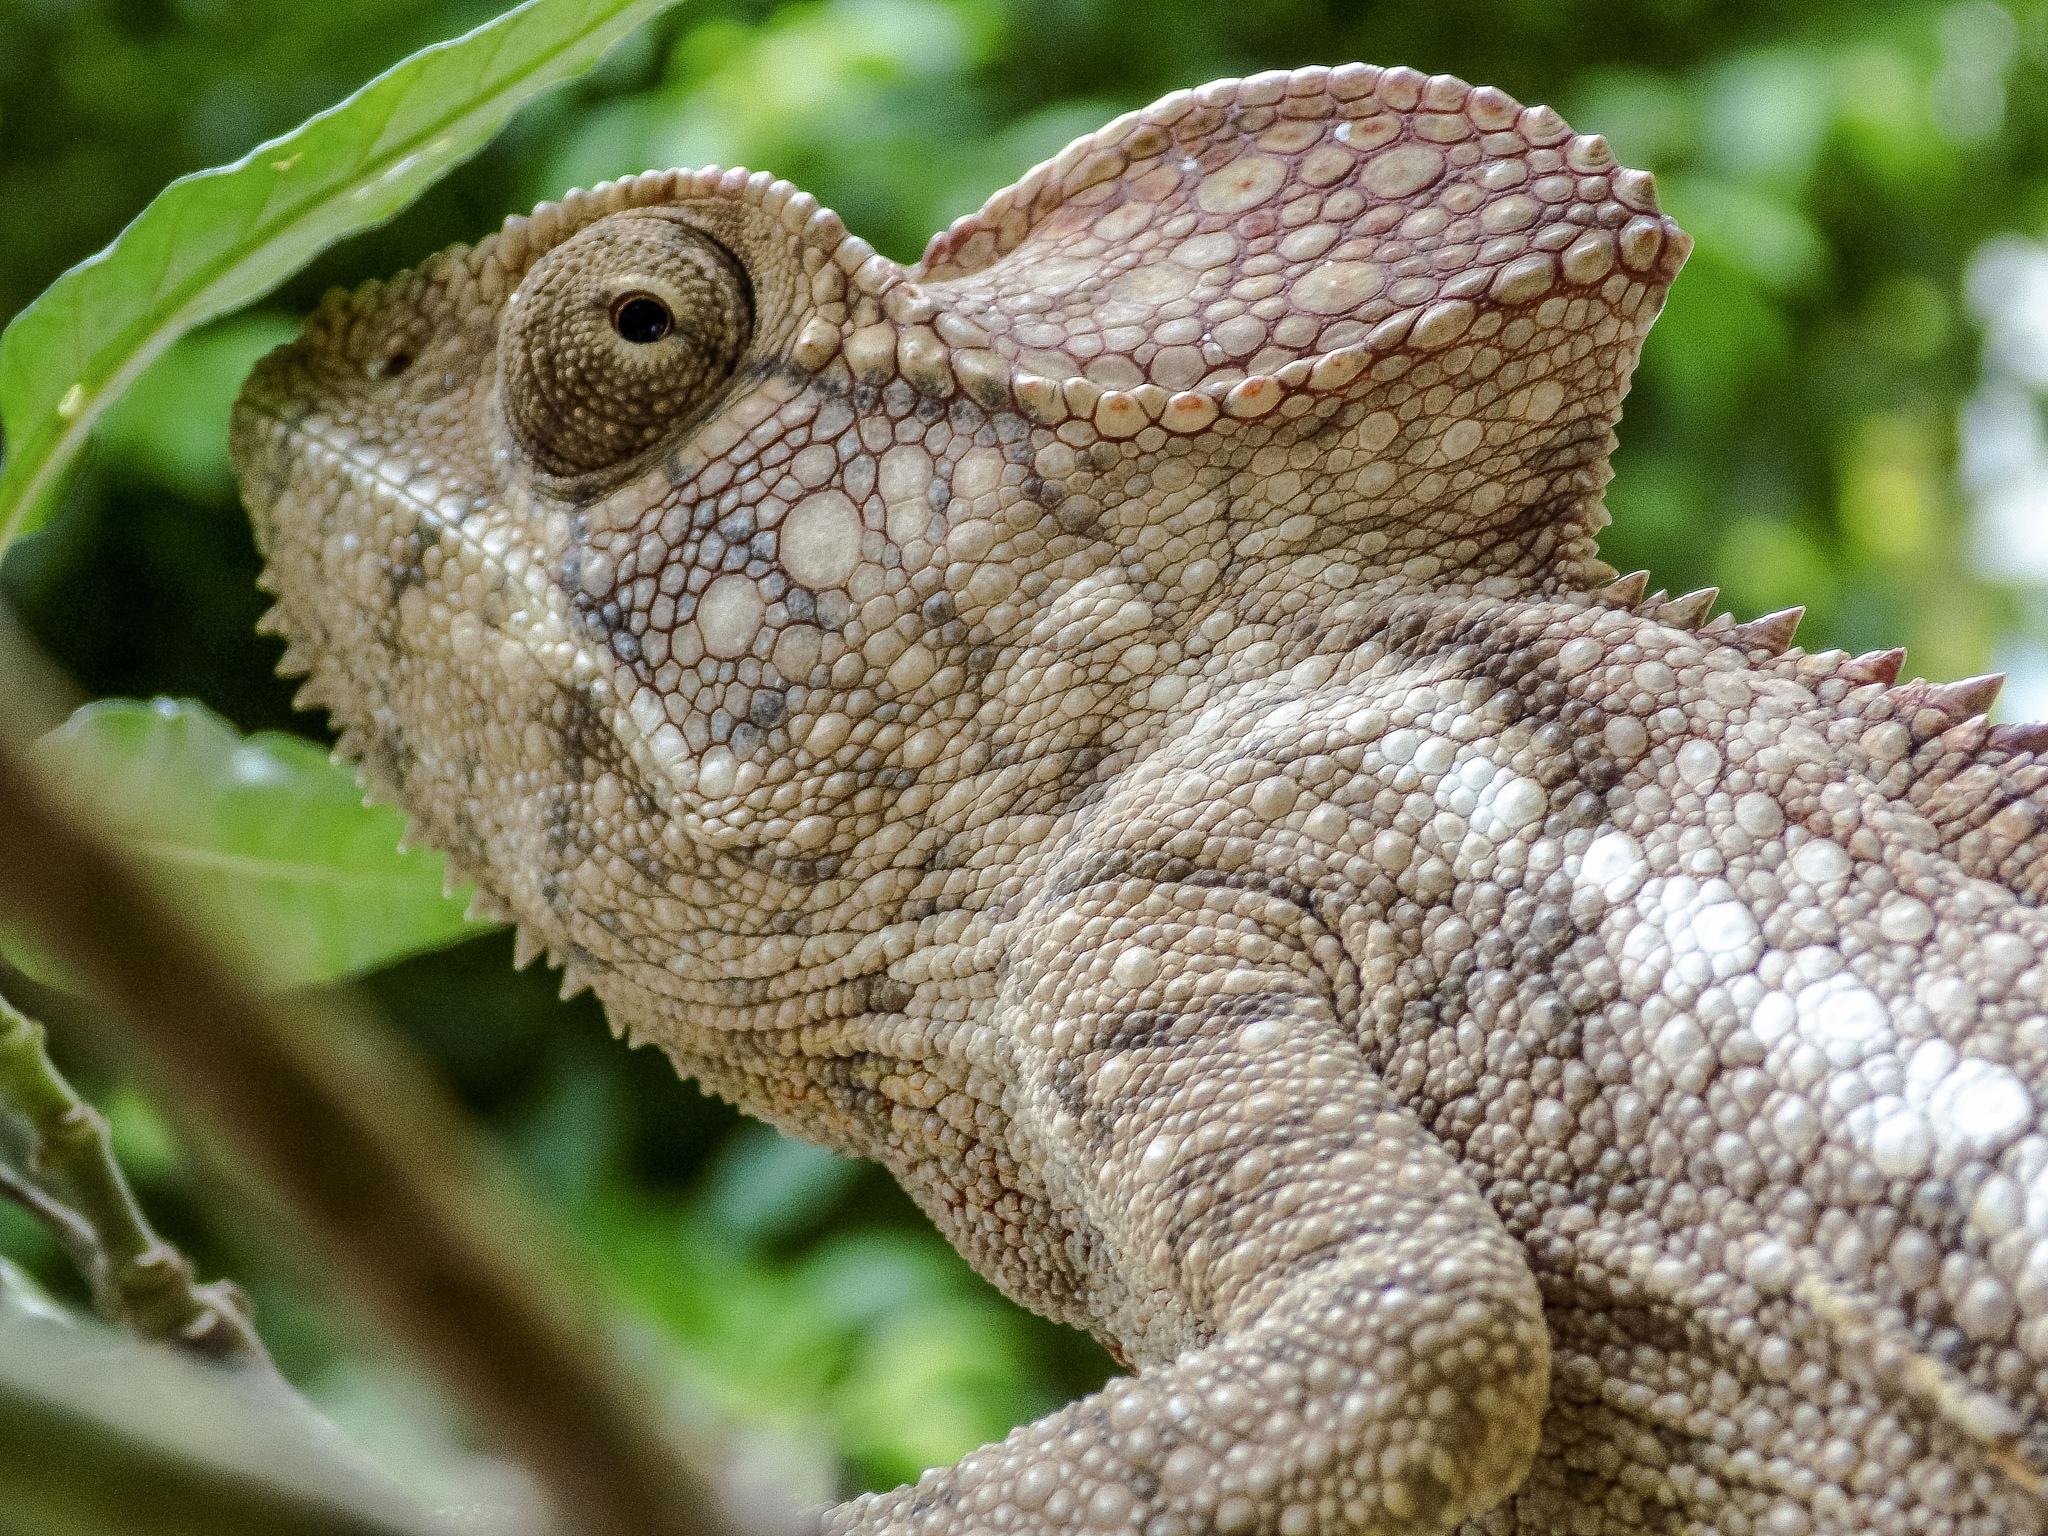 a chameleon by Cesare Vatrano